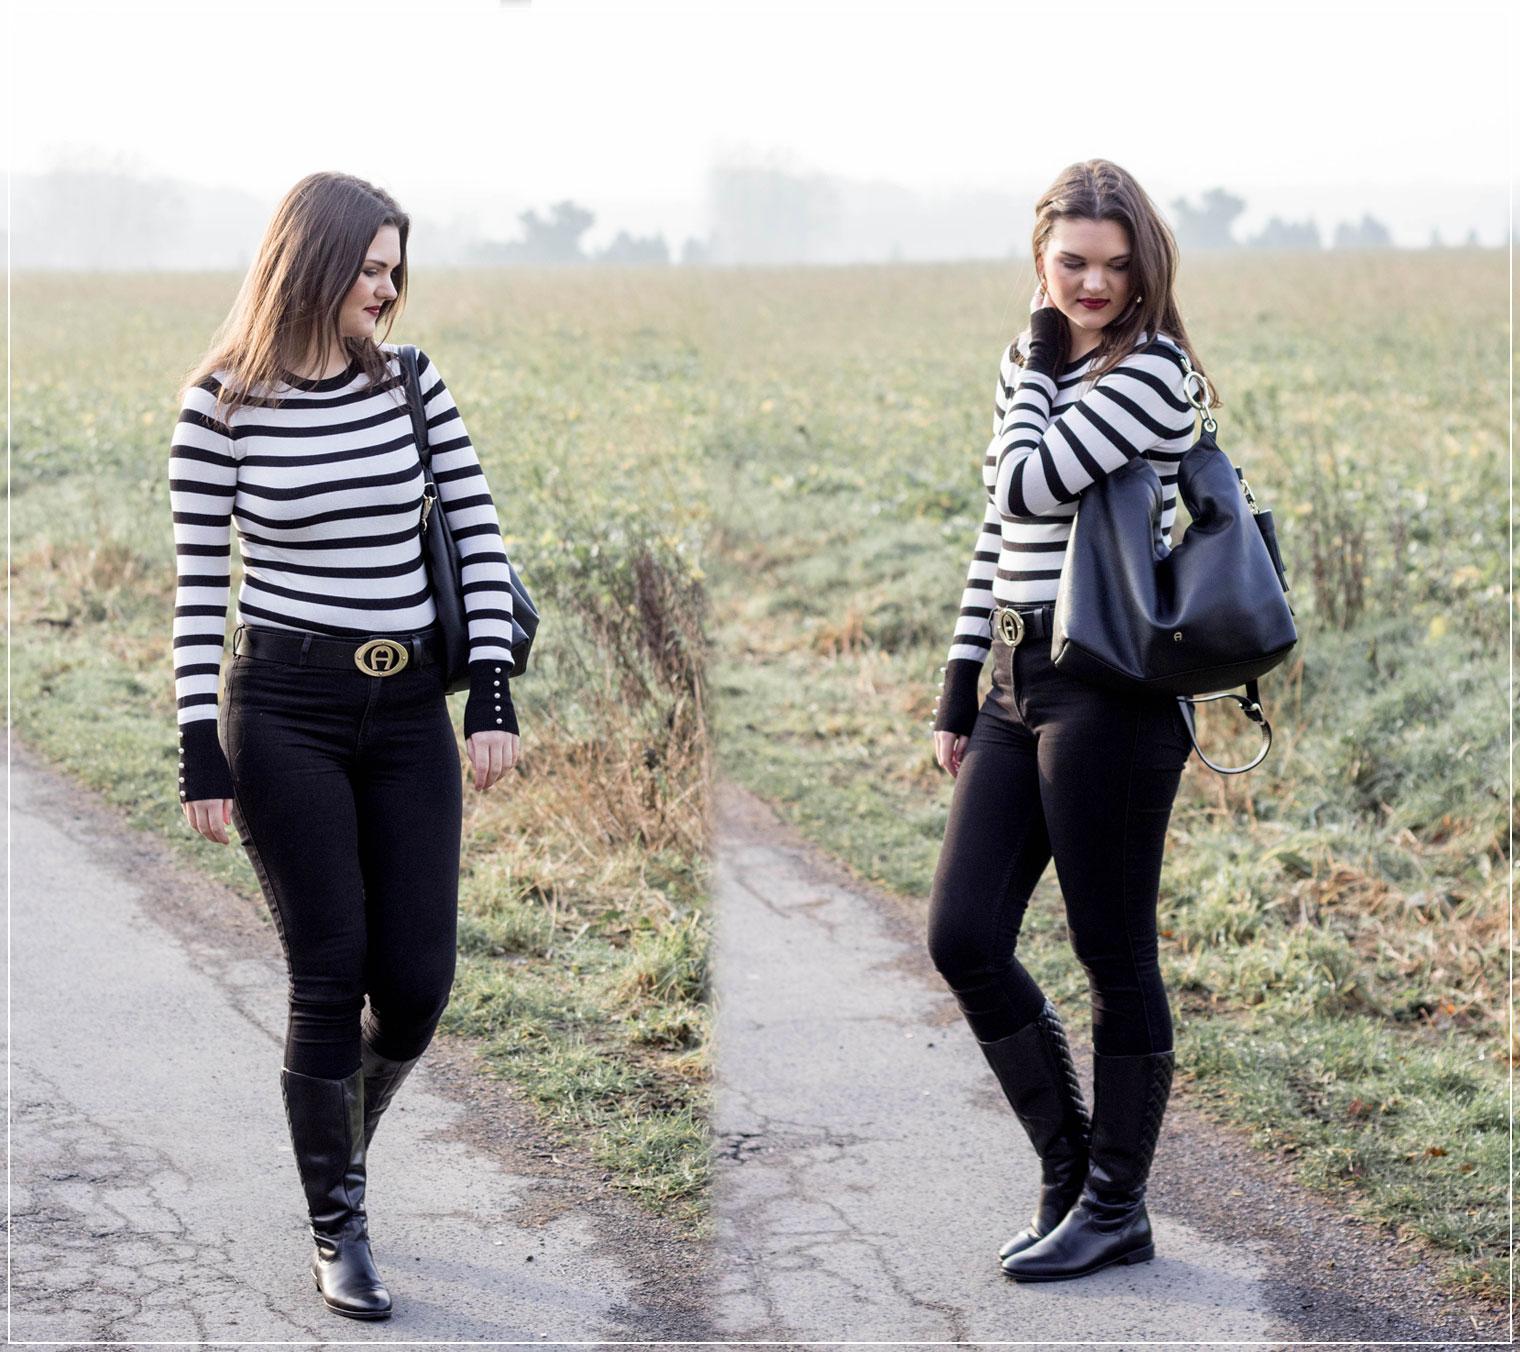 Classy Style, Black and White, Aigner, Designerfashion, Fast-Fashion, Winterstyle, Modebloggerin, Winteroutfit, Fashionbloggerin, Modeblog, Ruhrgebiet